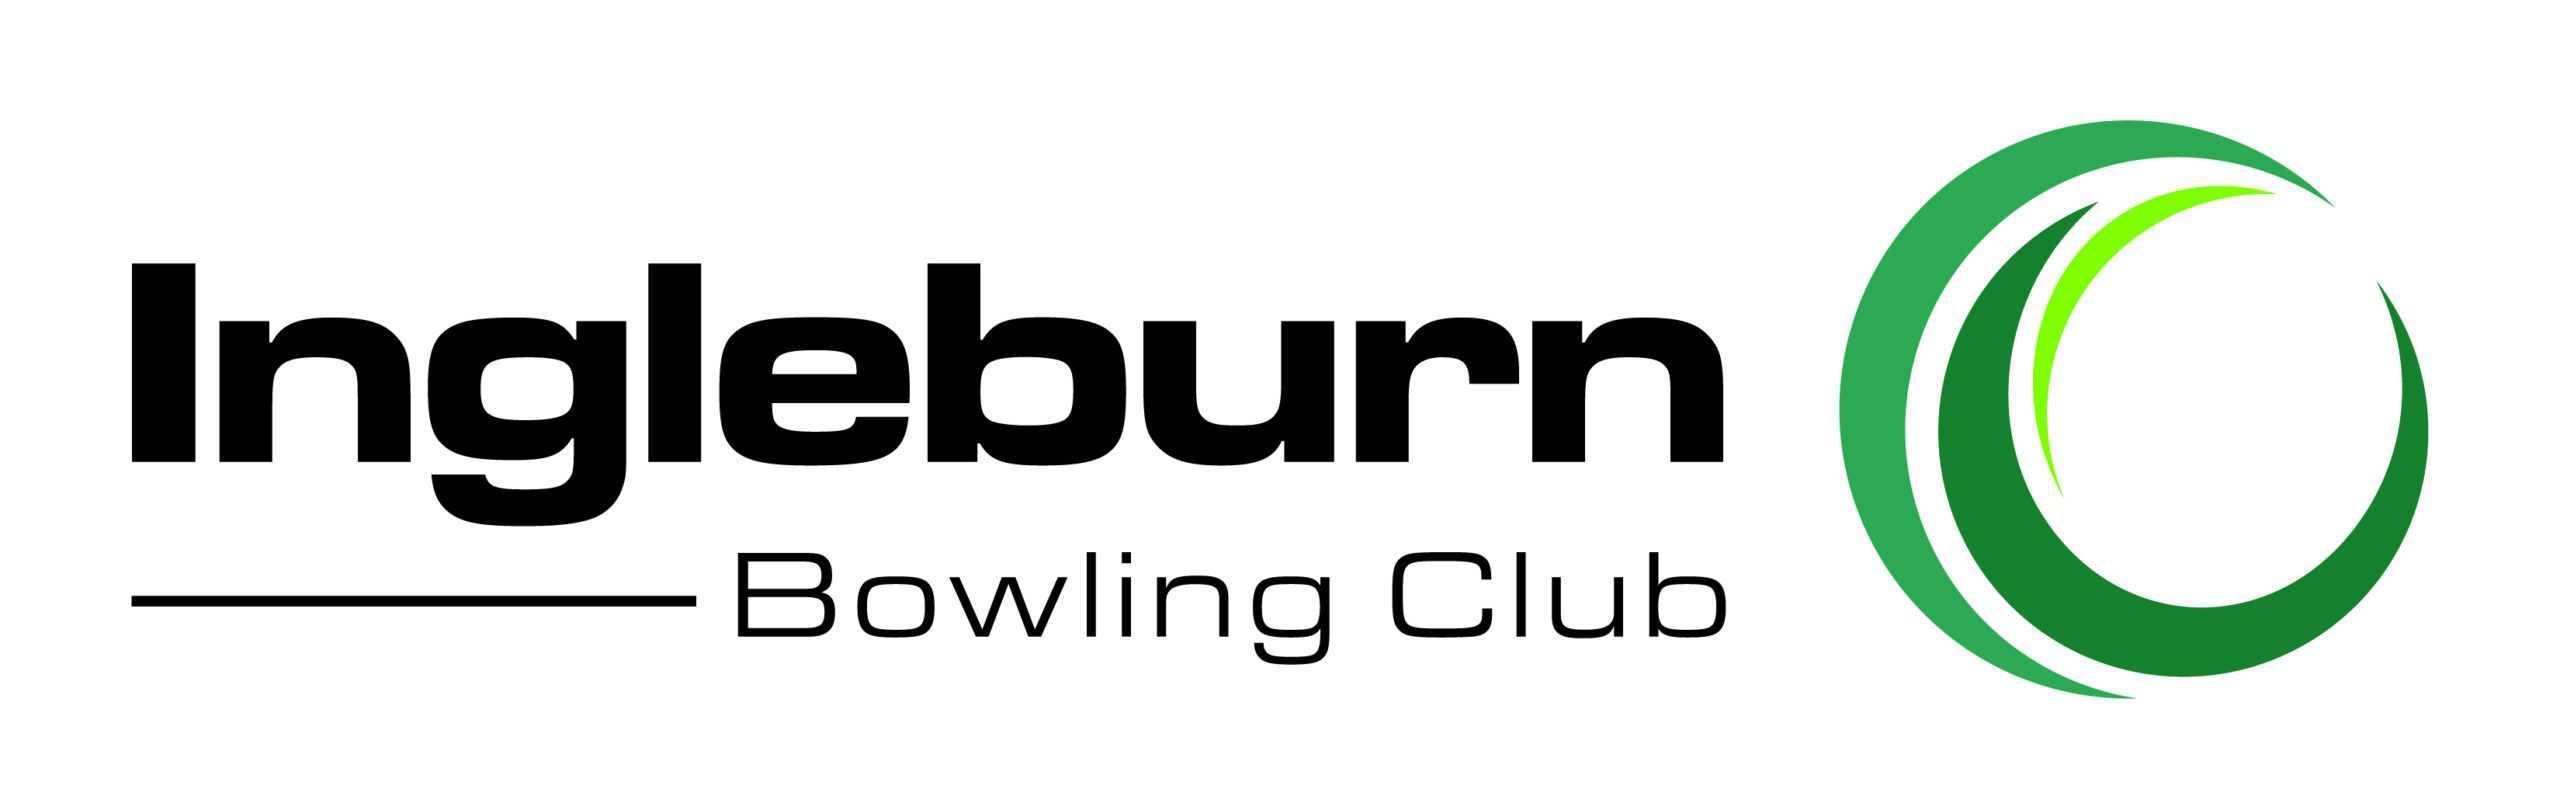 The Greens Ingleburn Bowling Club